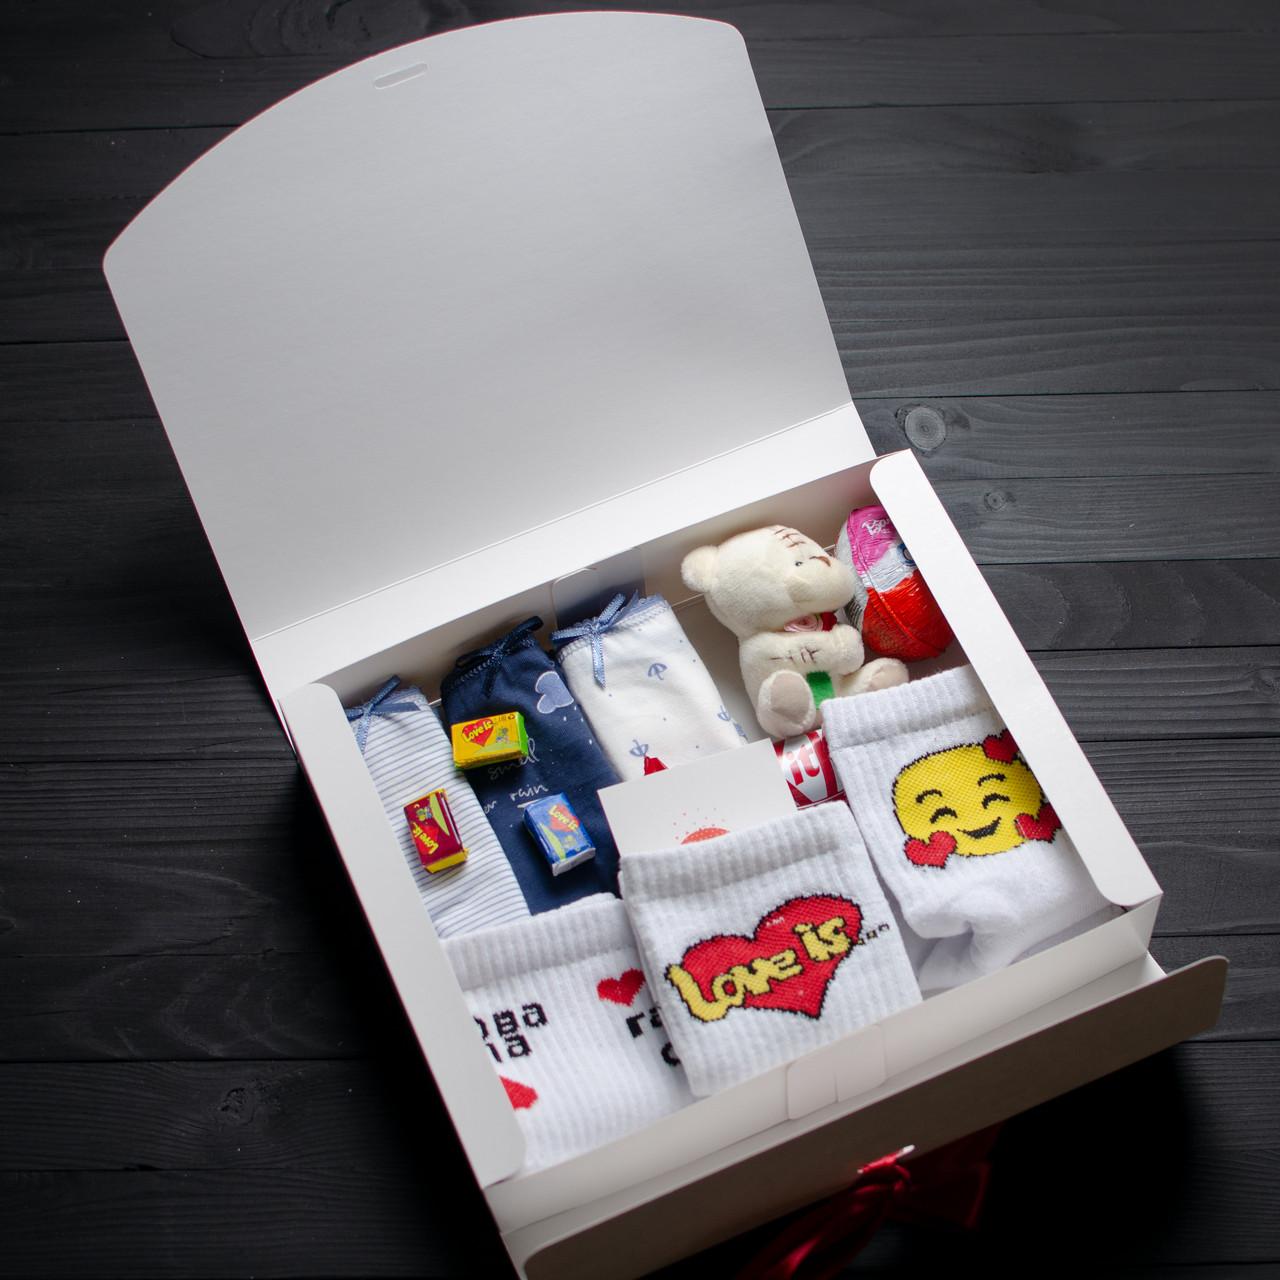 Подарочный набор женский. Трусики Зонт 3 шт, Teddy букет бел, носки Смайл, Love is, Гарні очі, Kinder, KitKat